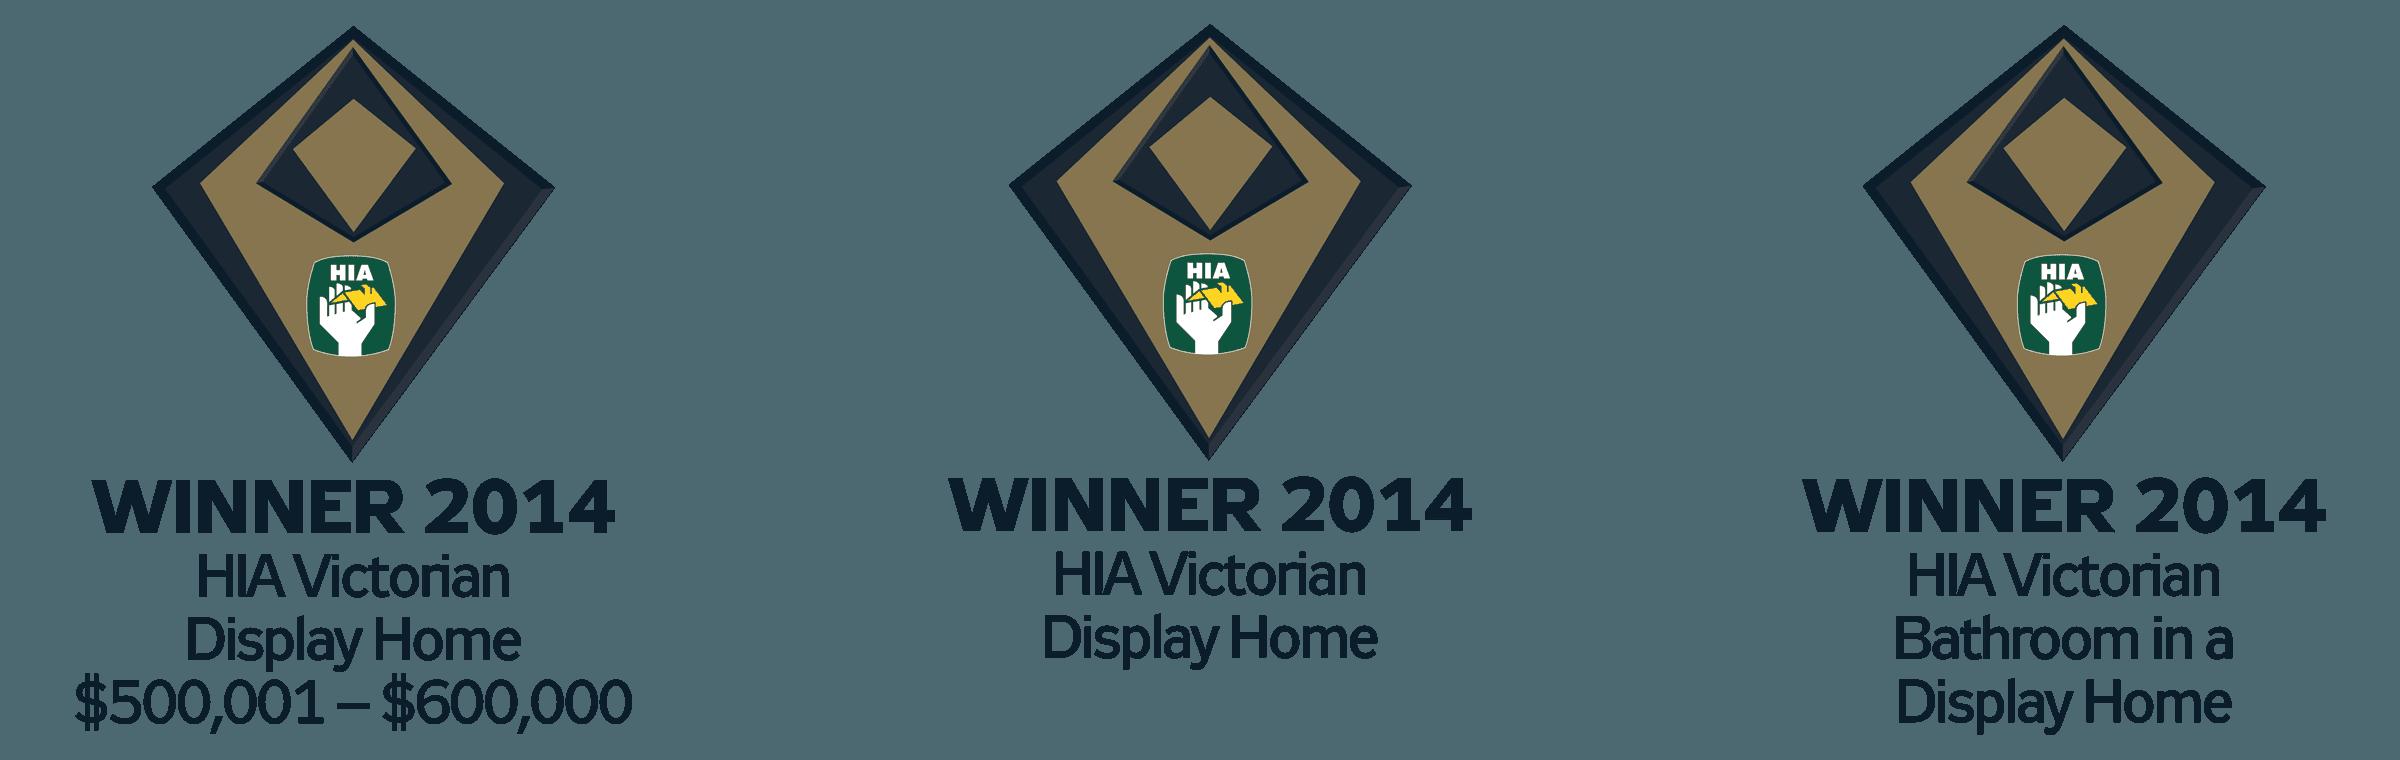 hia winner awards